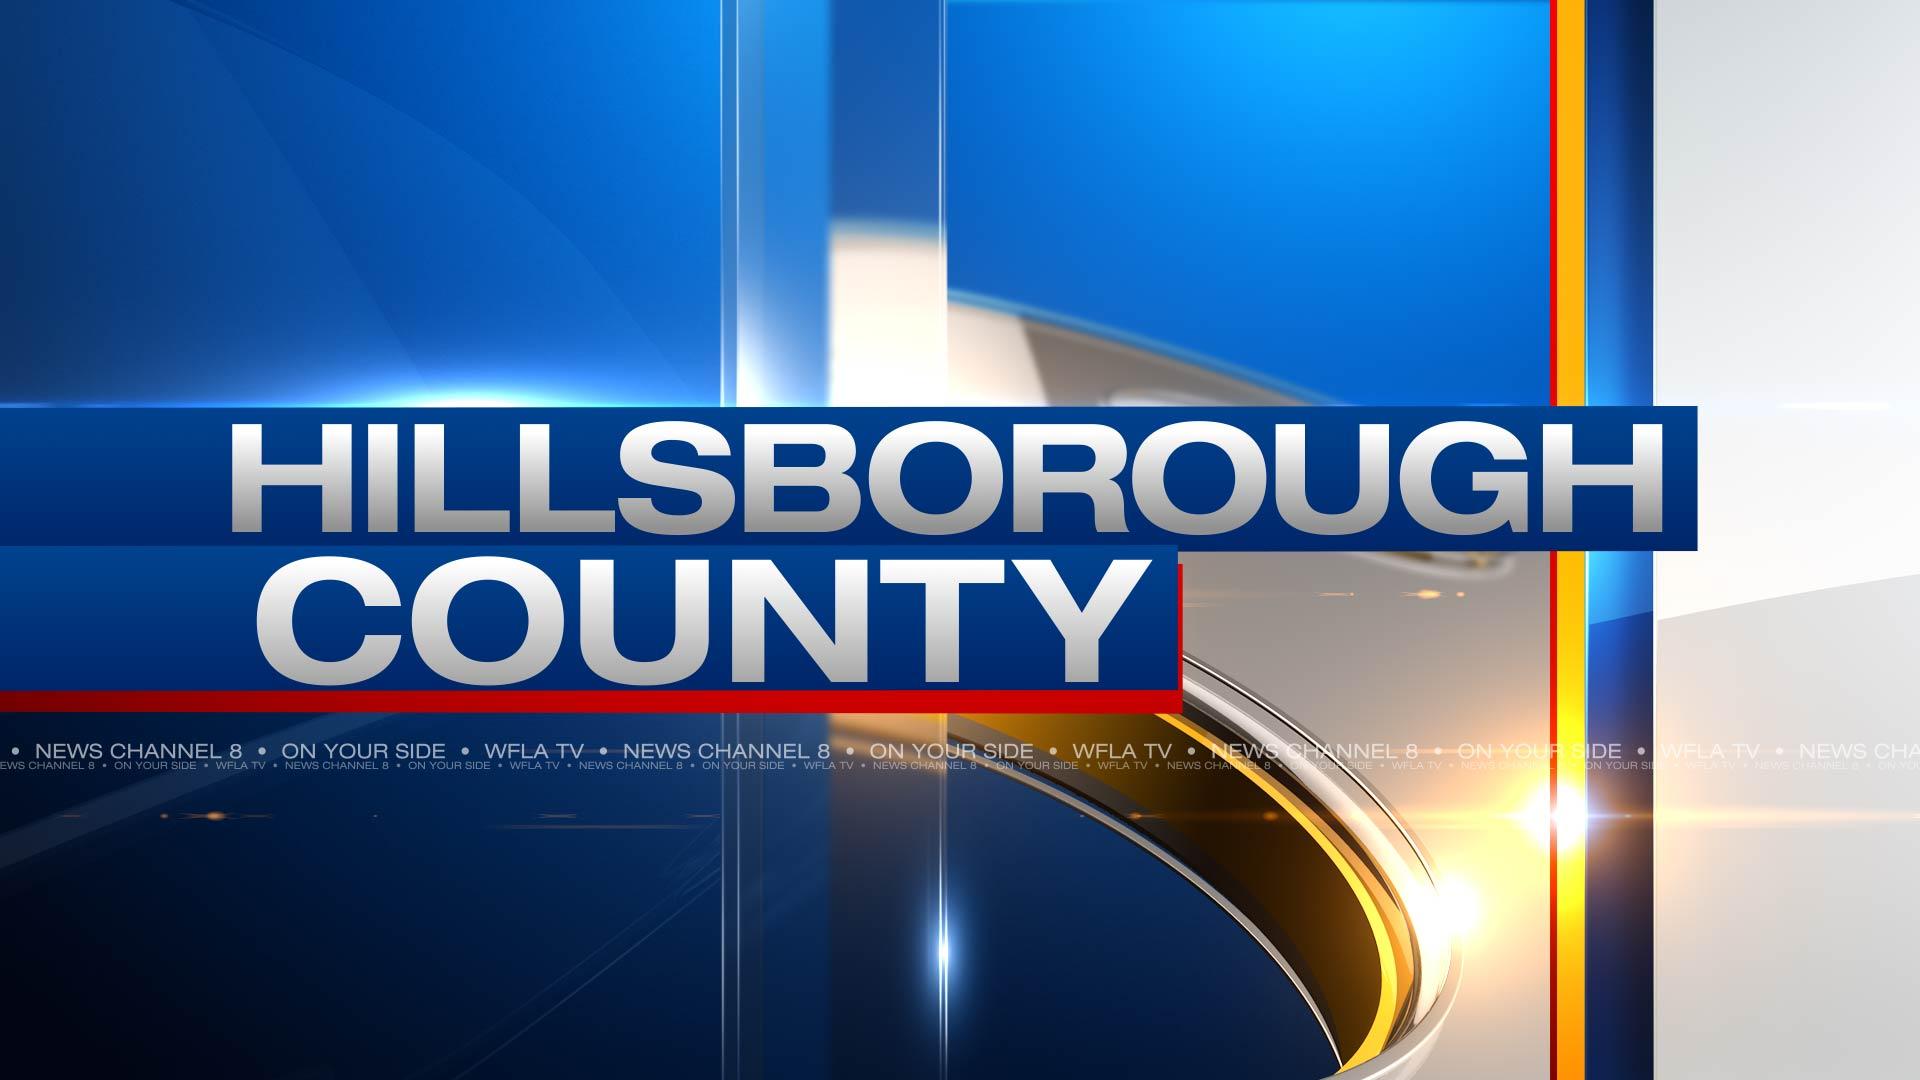 Hillsborough County generic